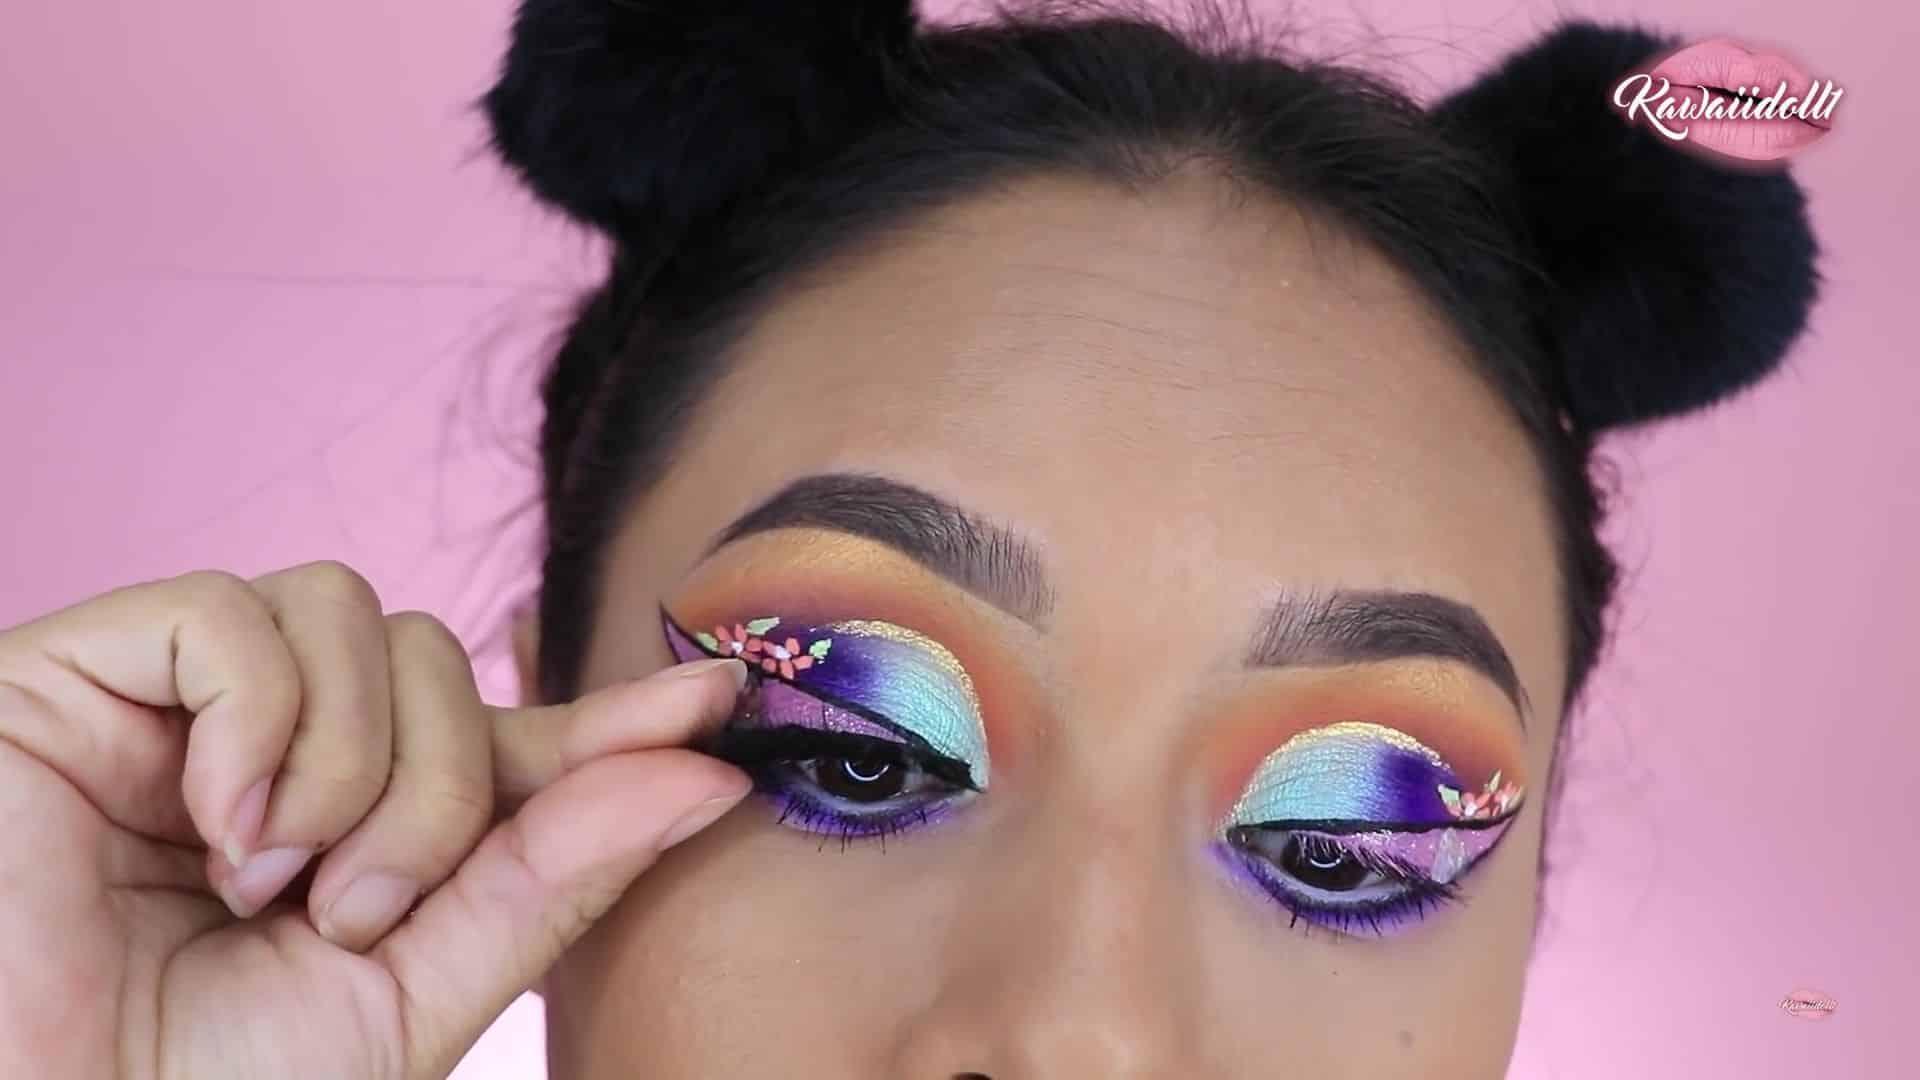 maquillaje de fantasía rapunzel 2020 kawaiidoll1 pestañas postizas. colocar pestañas postizas.